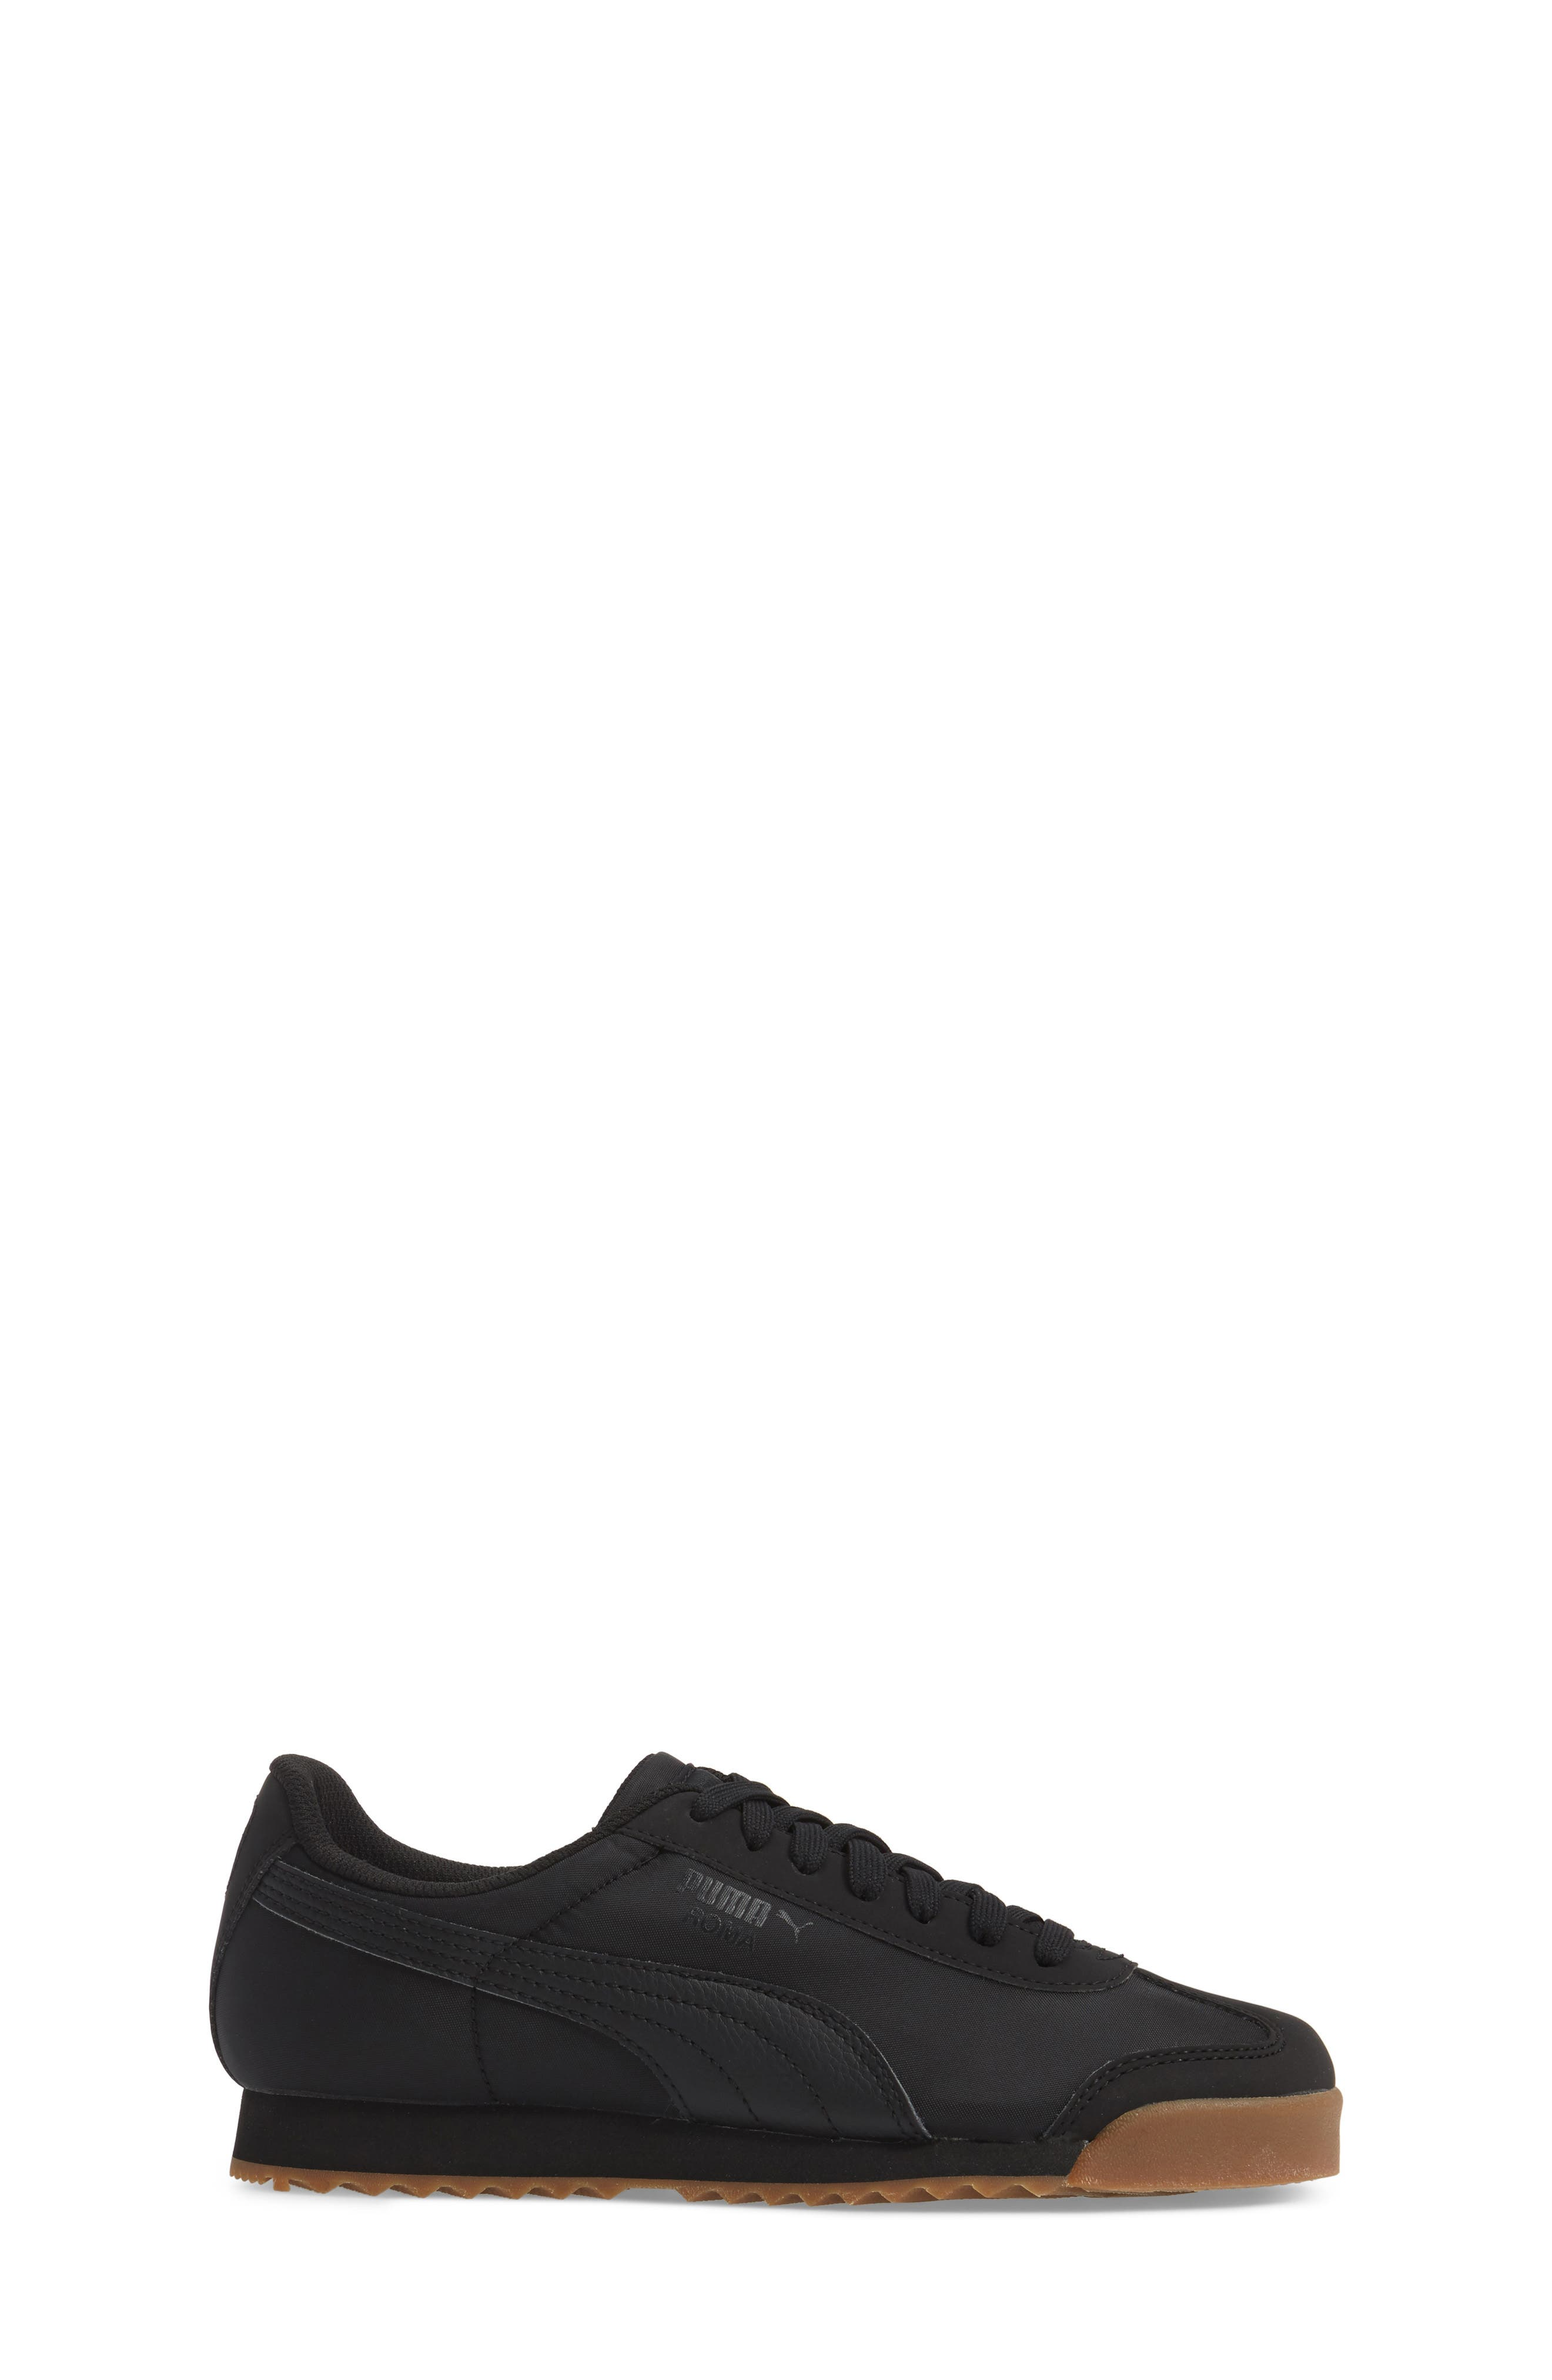 PUMA,                             Roma Basic Summer Sneaker,                             Alternate thumbnail 3, color,                             001